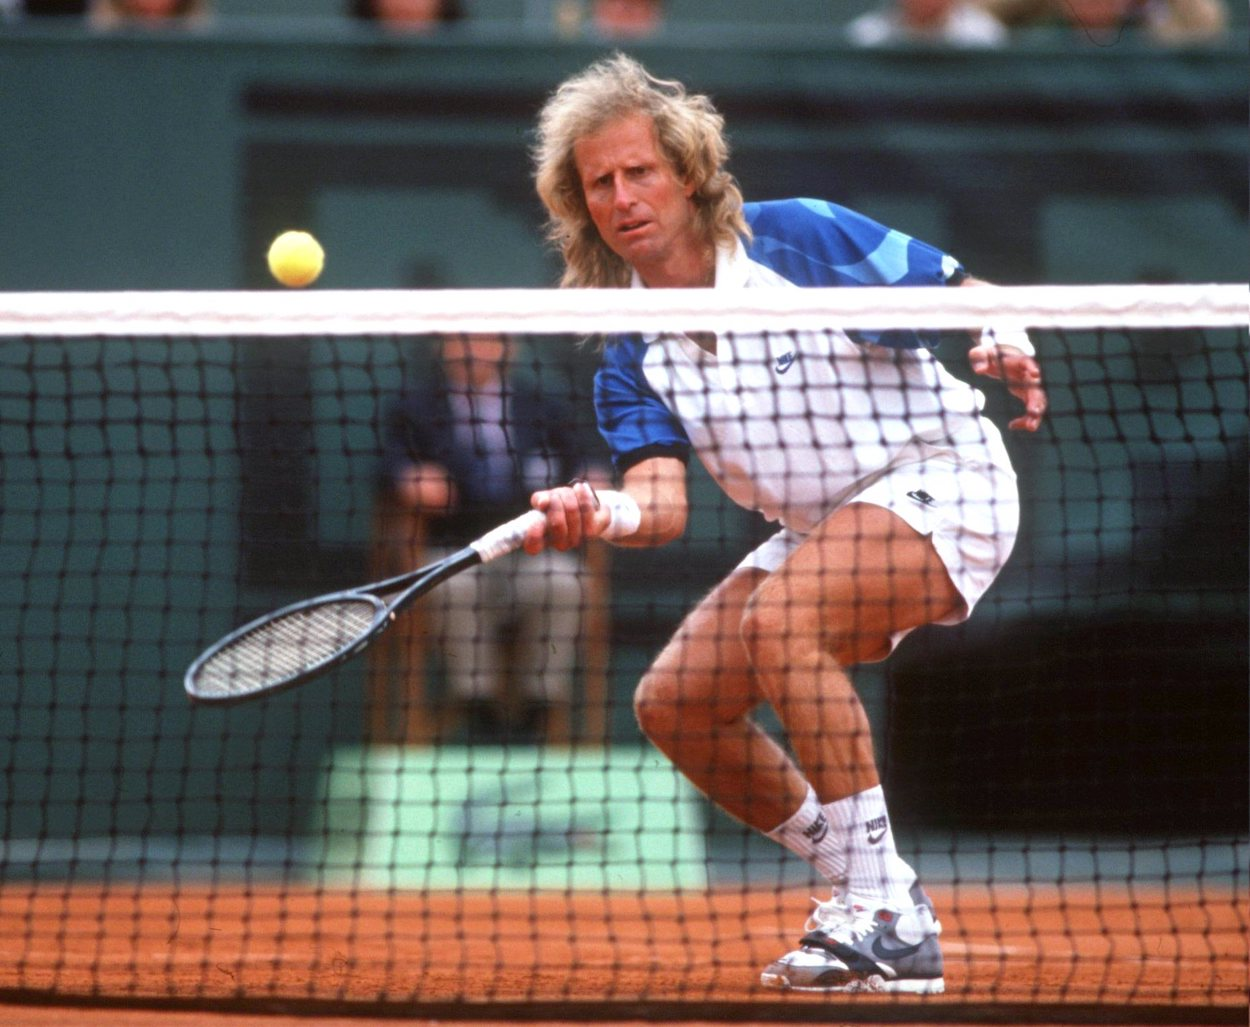 Tennis Star Vitas Gerulaitis Tragically Died in a Bizarre Incident of Carbon Monoxide Poisoning